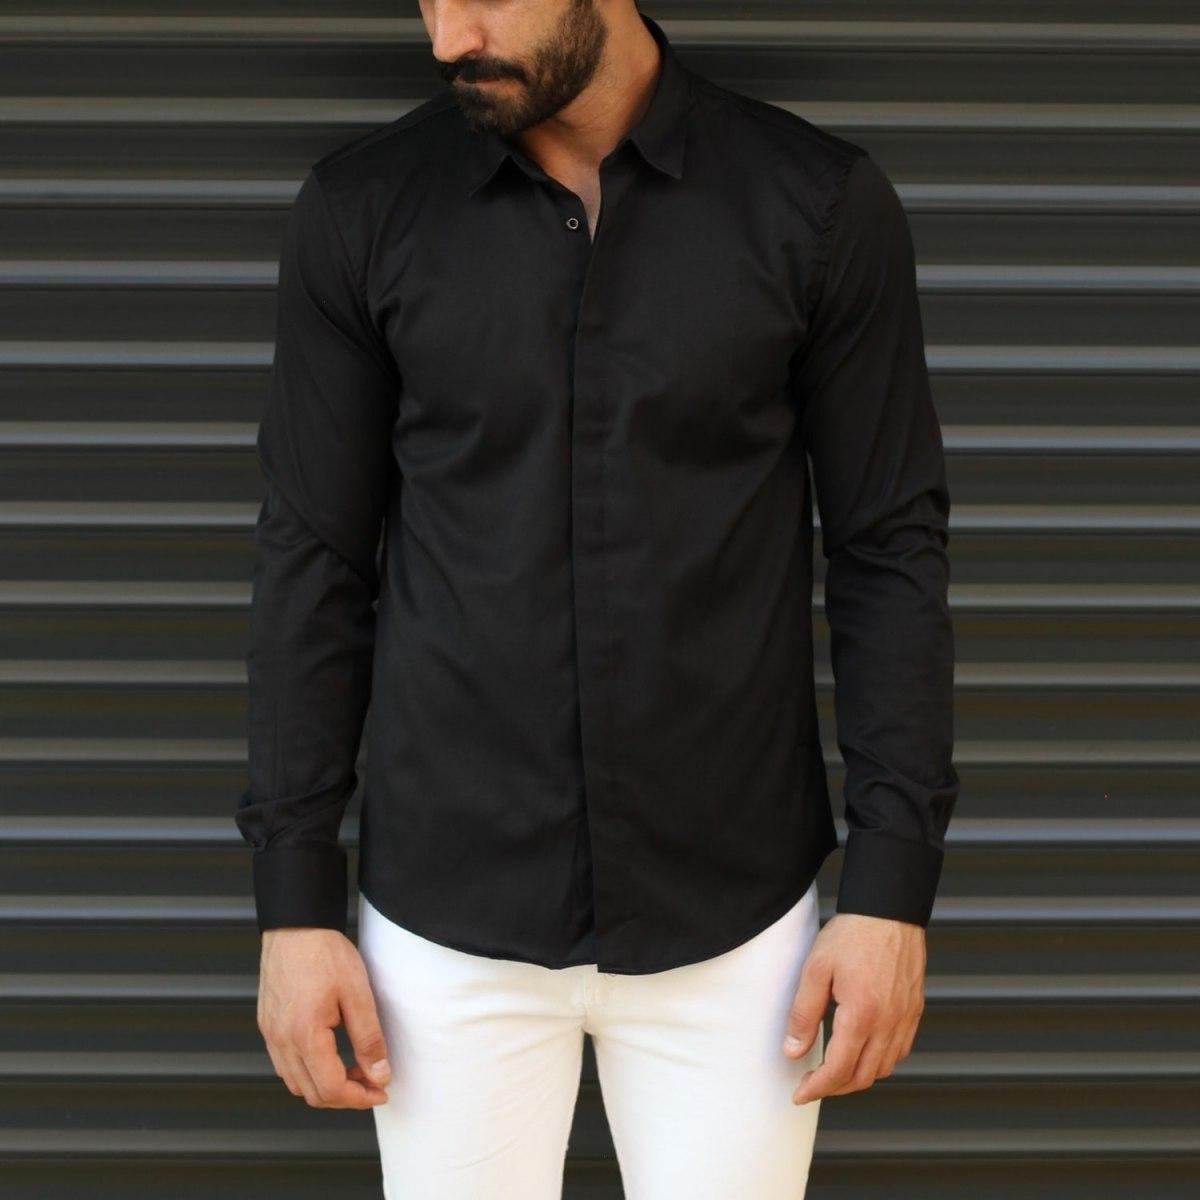 Men's Button Down Fitted Casual Shirt Vivid Black Mv Premium Brand - 1